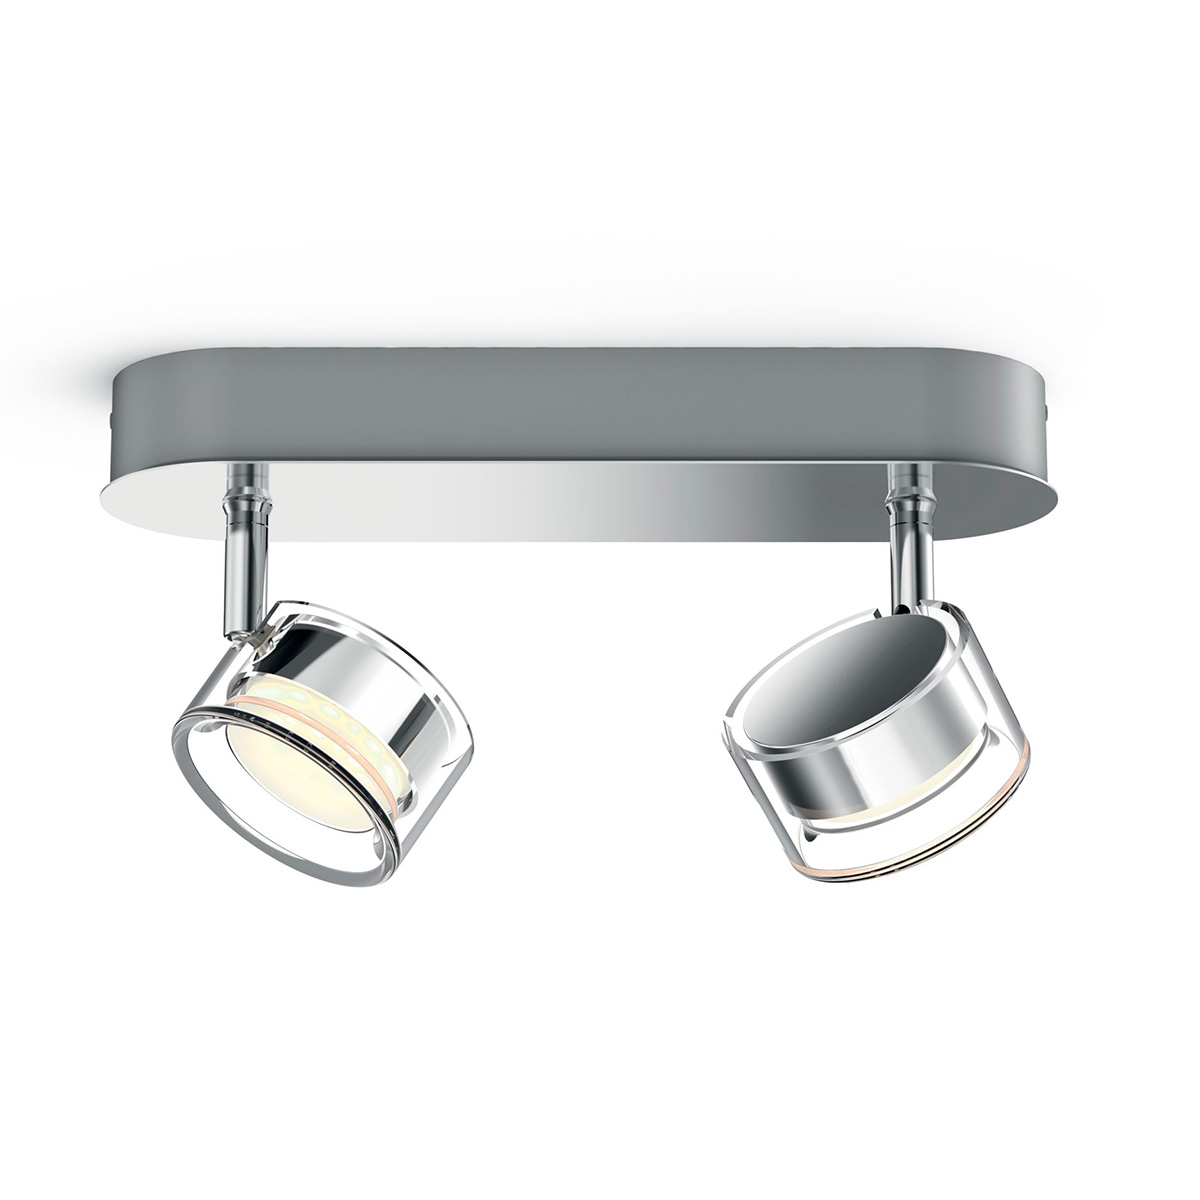 Image of   Philips myLiving loftlampe med spot - Worchester - Krom